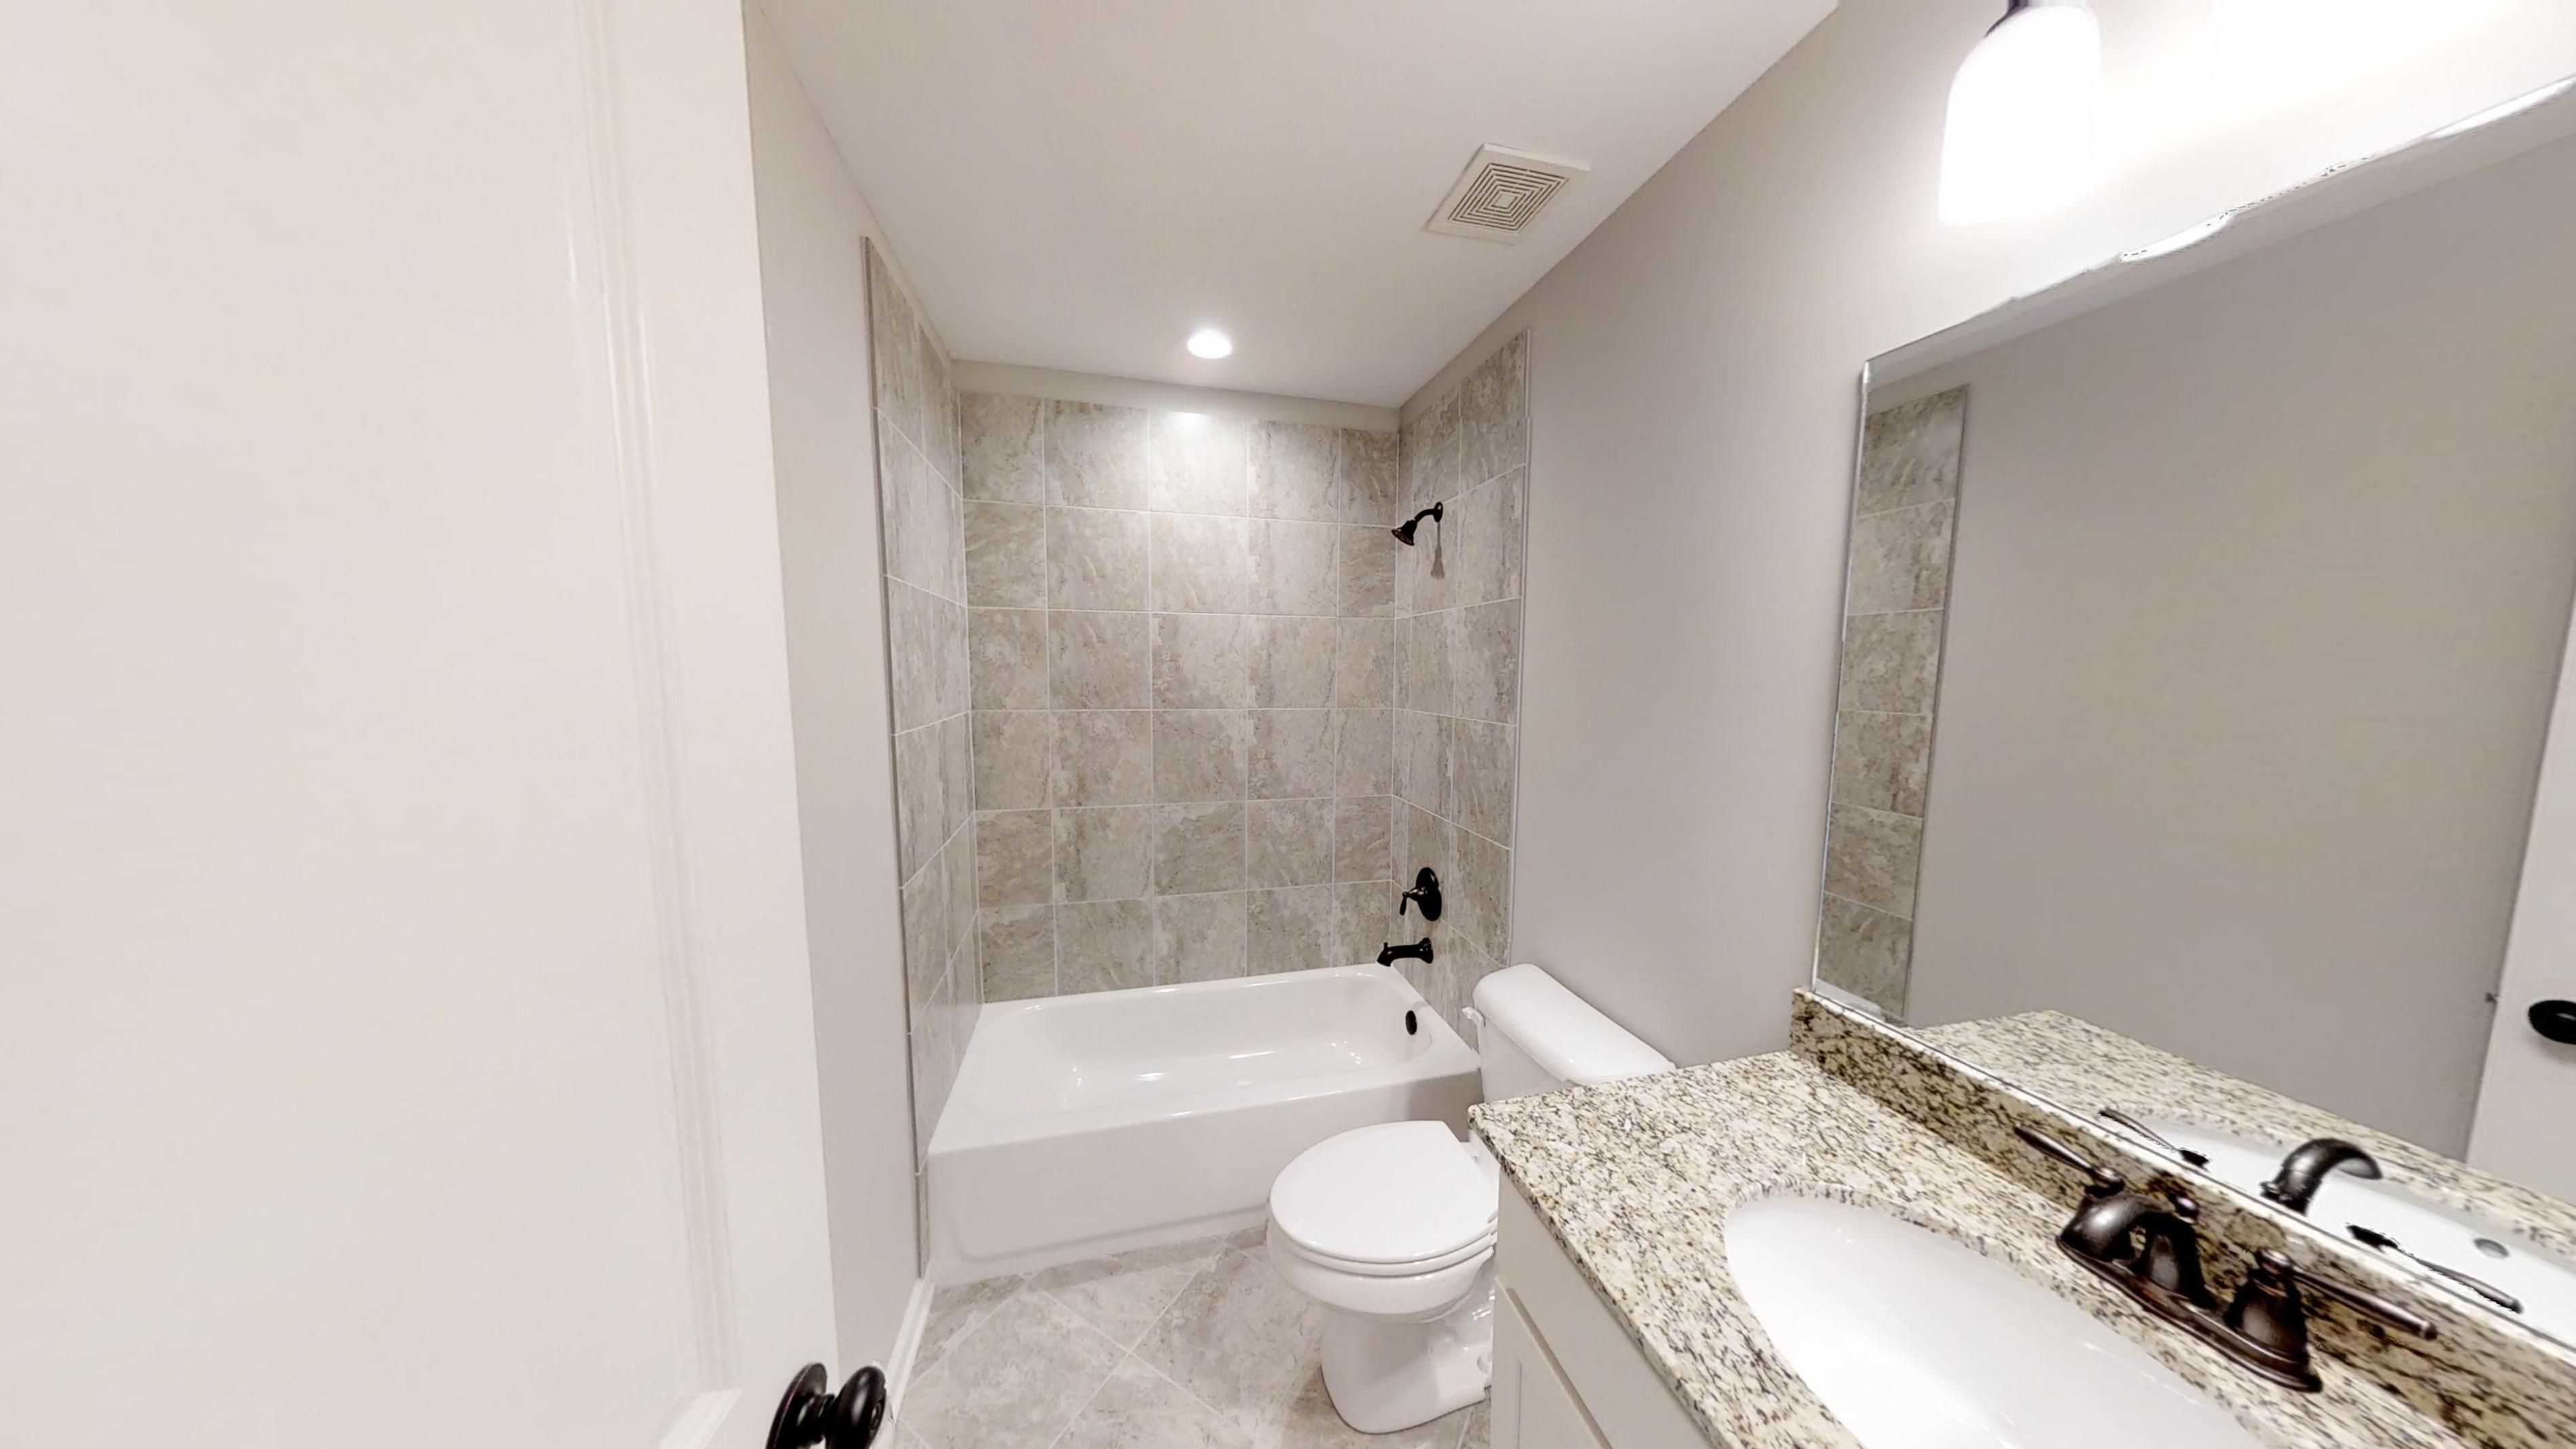 Bathroom featured in the Abbington By Regency Homebuilders in Memphis, TN